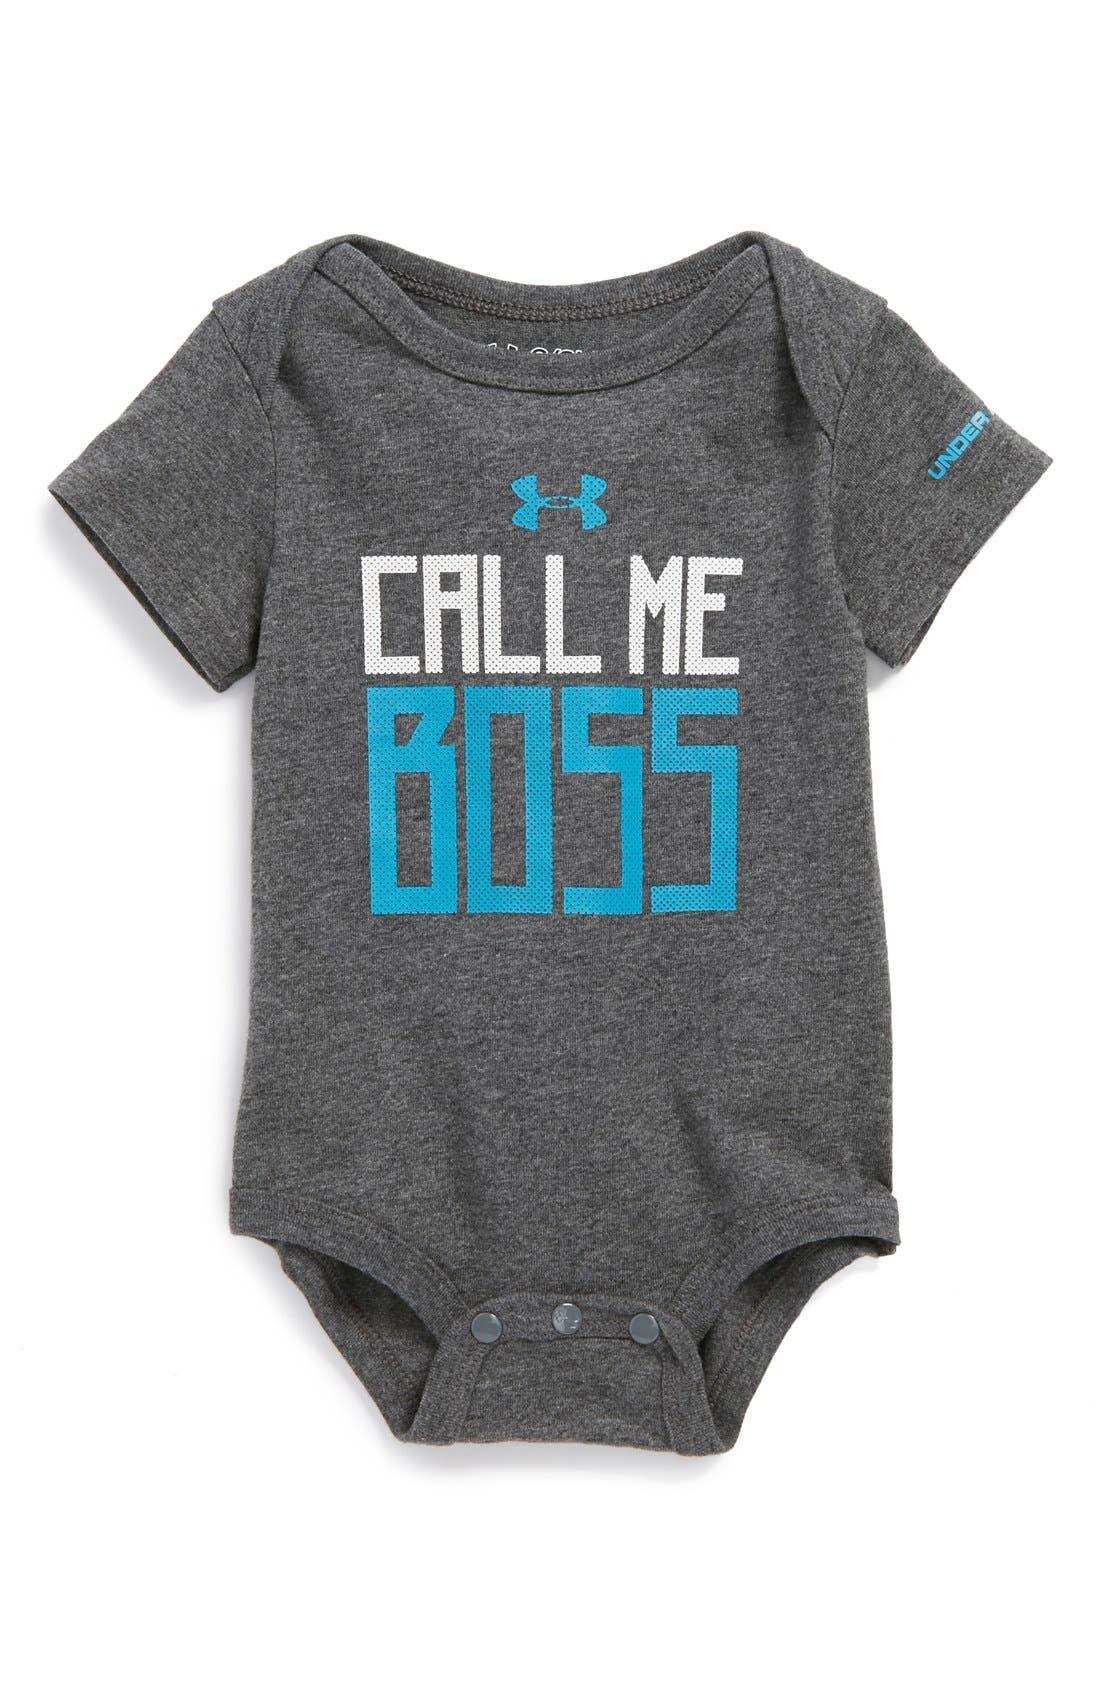 Alternate Image 1 Selected - Under Armour 'Call Me Boss' HeatGear® Bodysuit (Baby Boys)